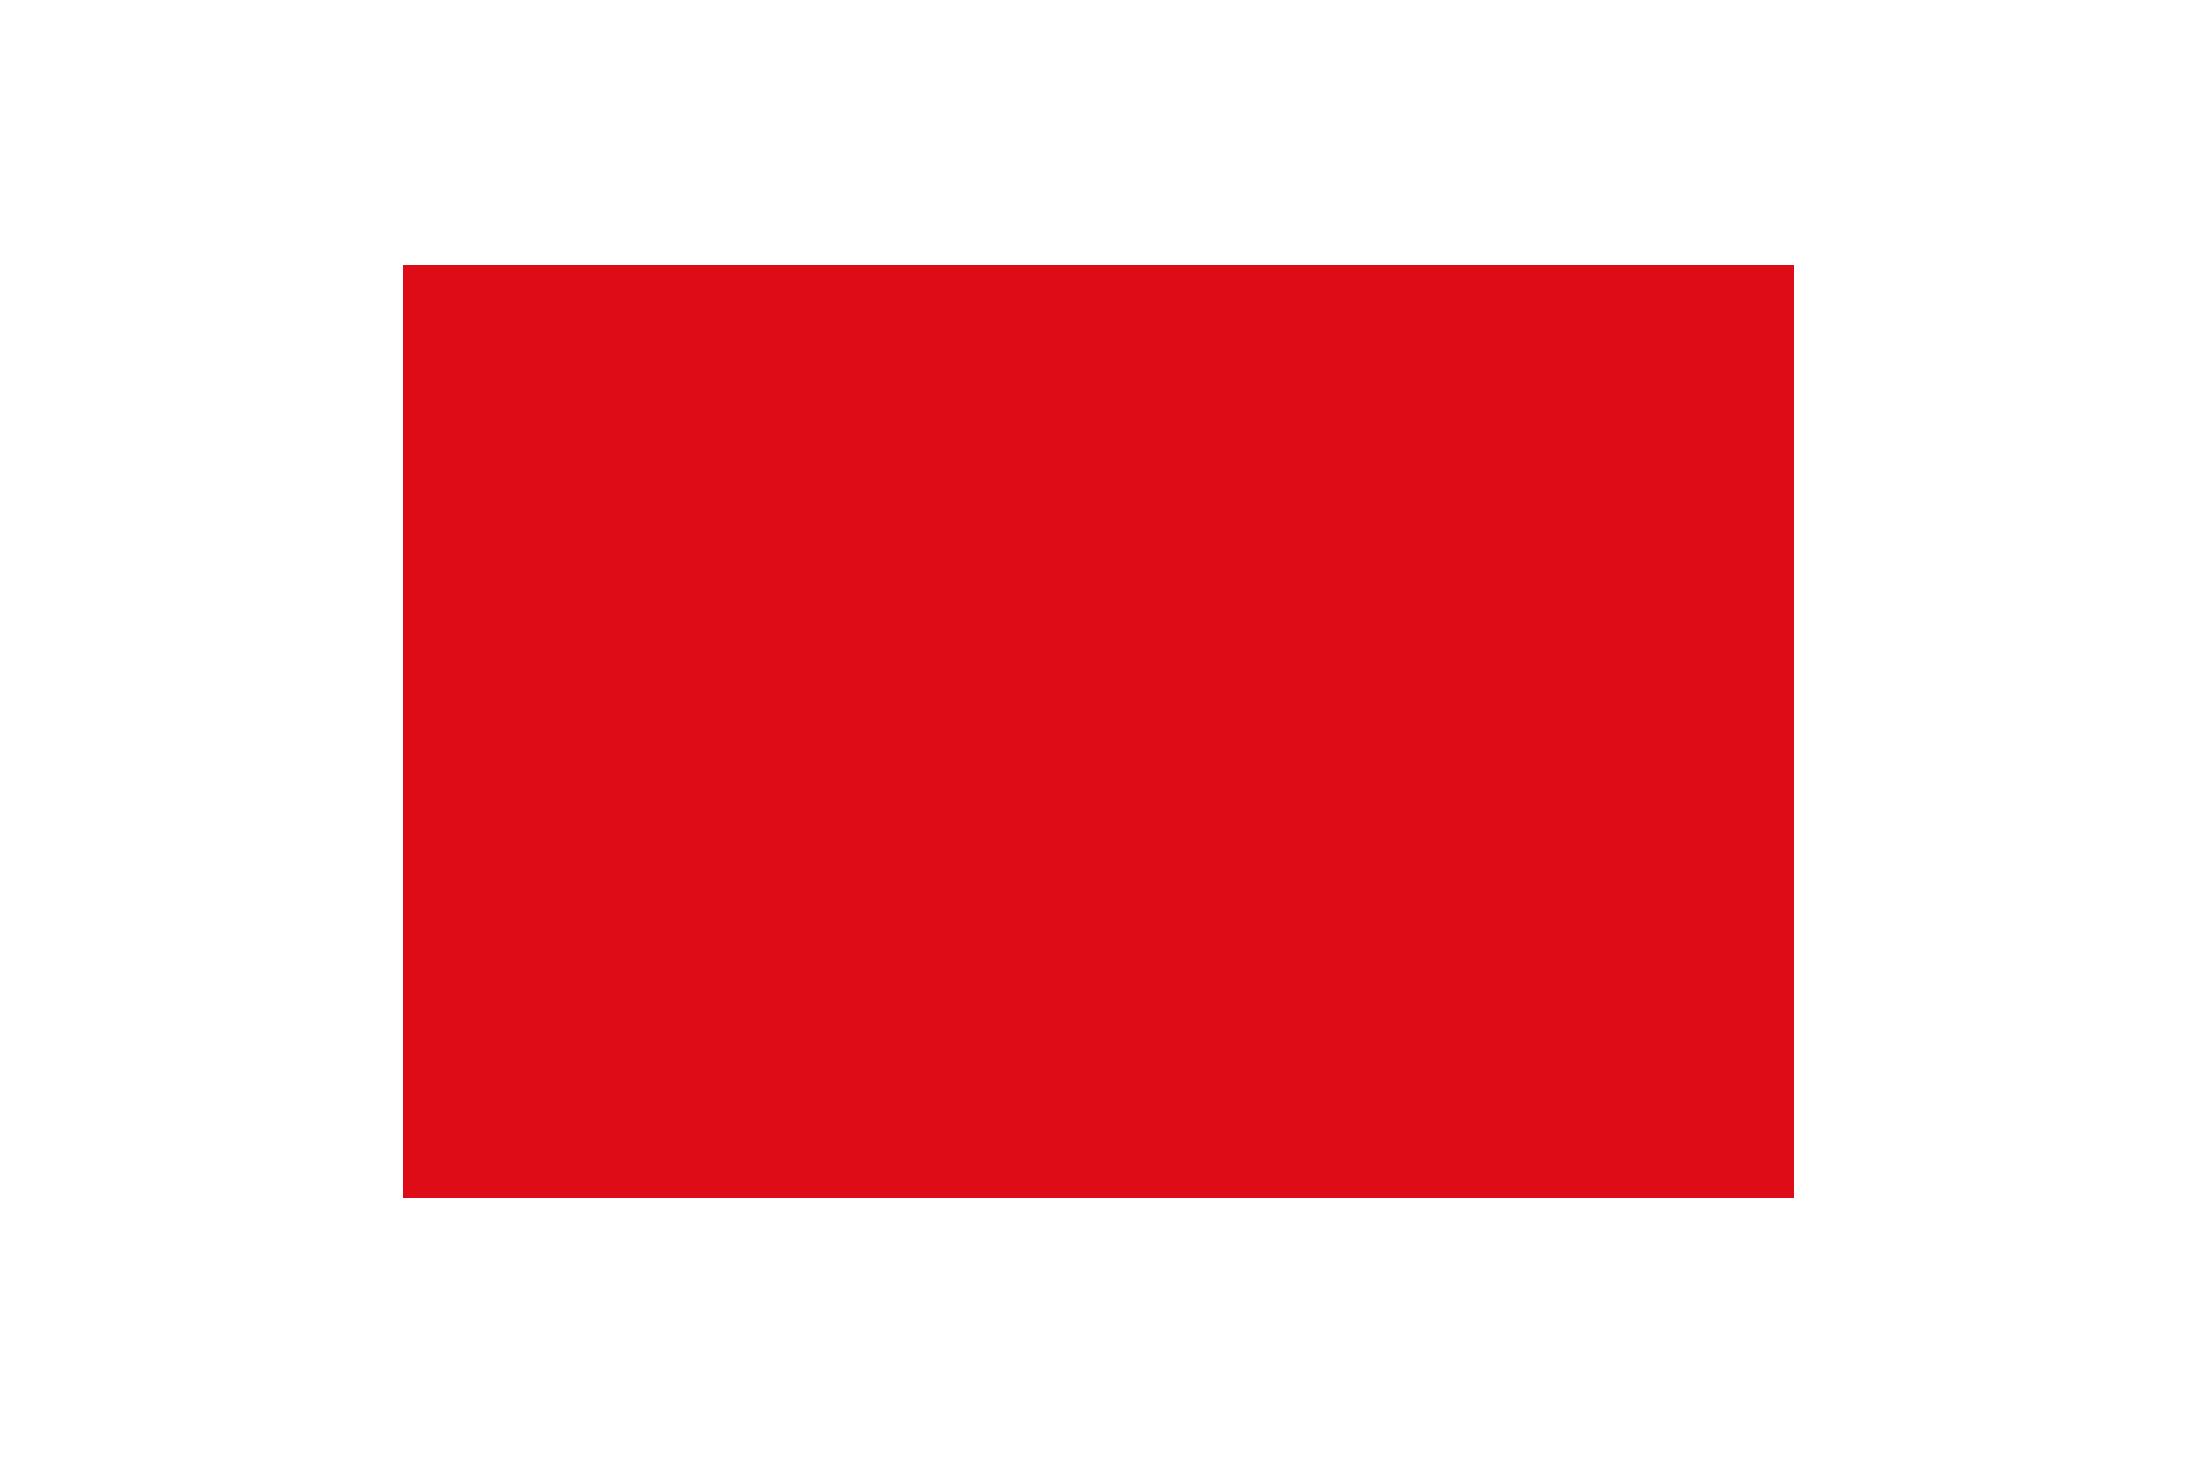 Grunge 15 percent label PSD